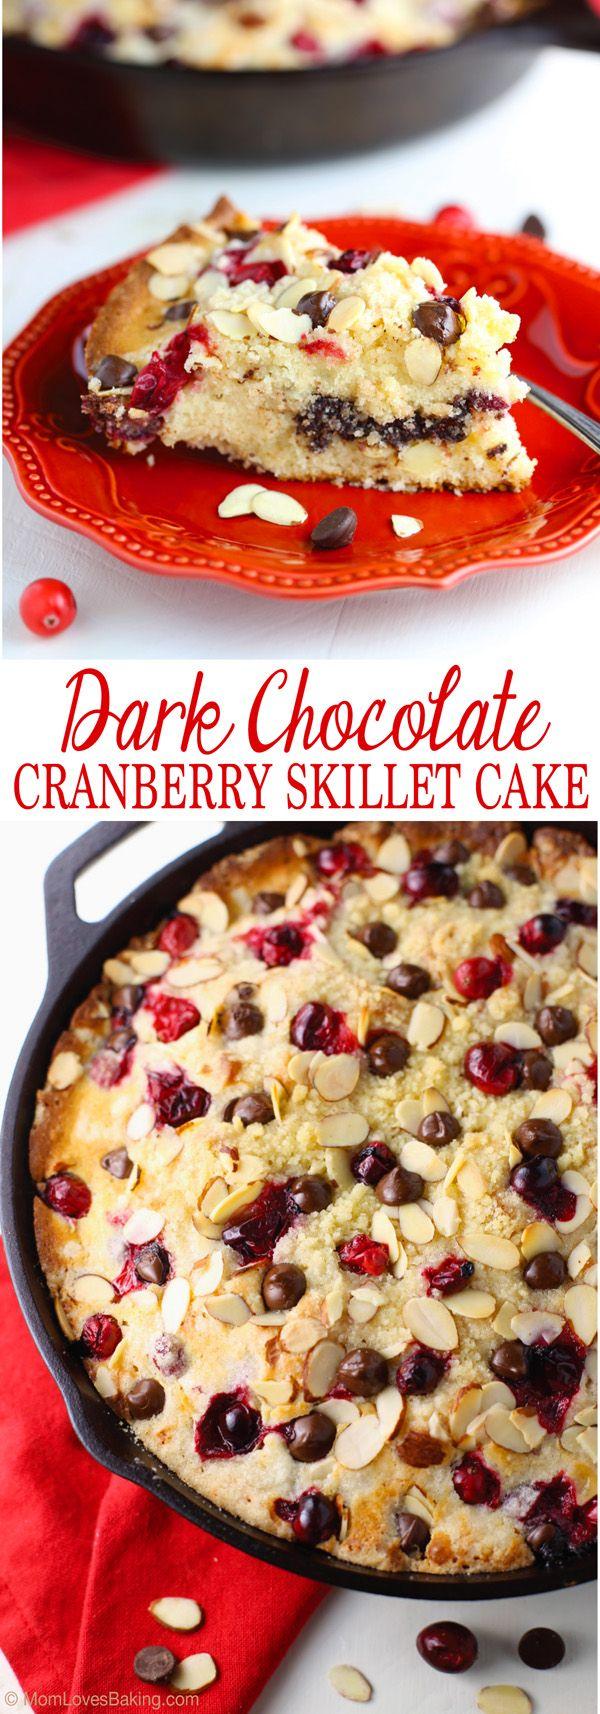 Dark Chocolate Cranberry Skillet Cake